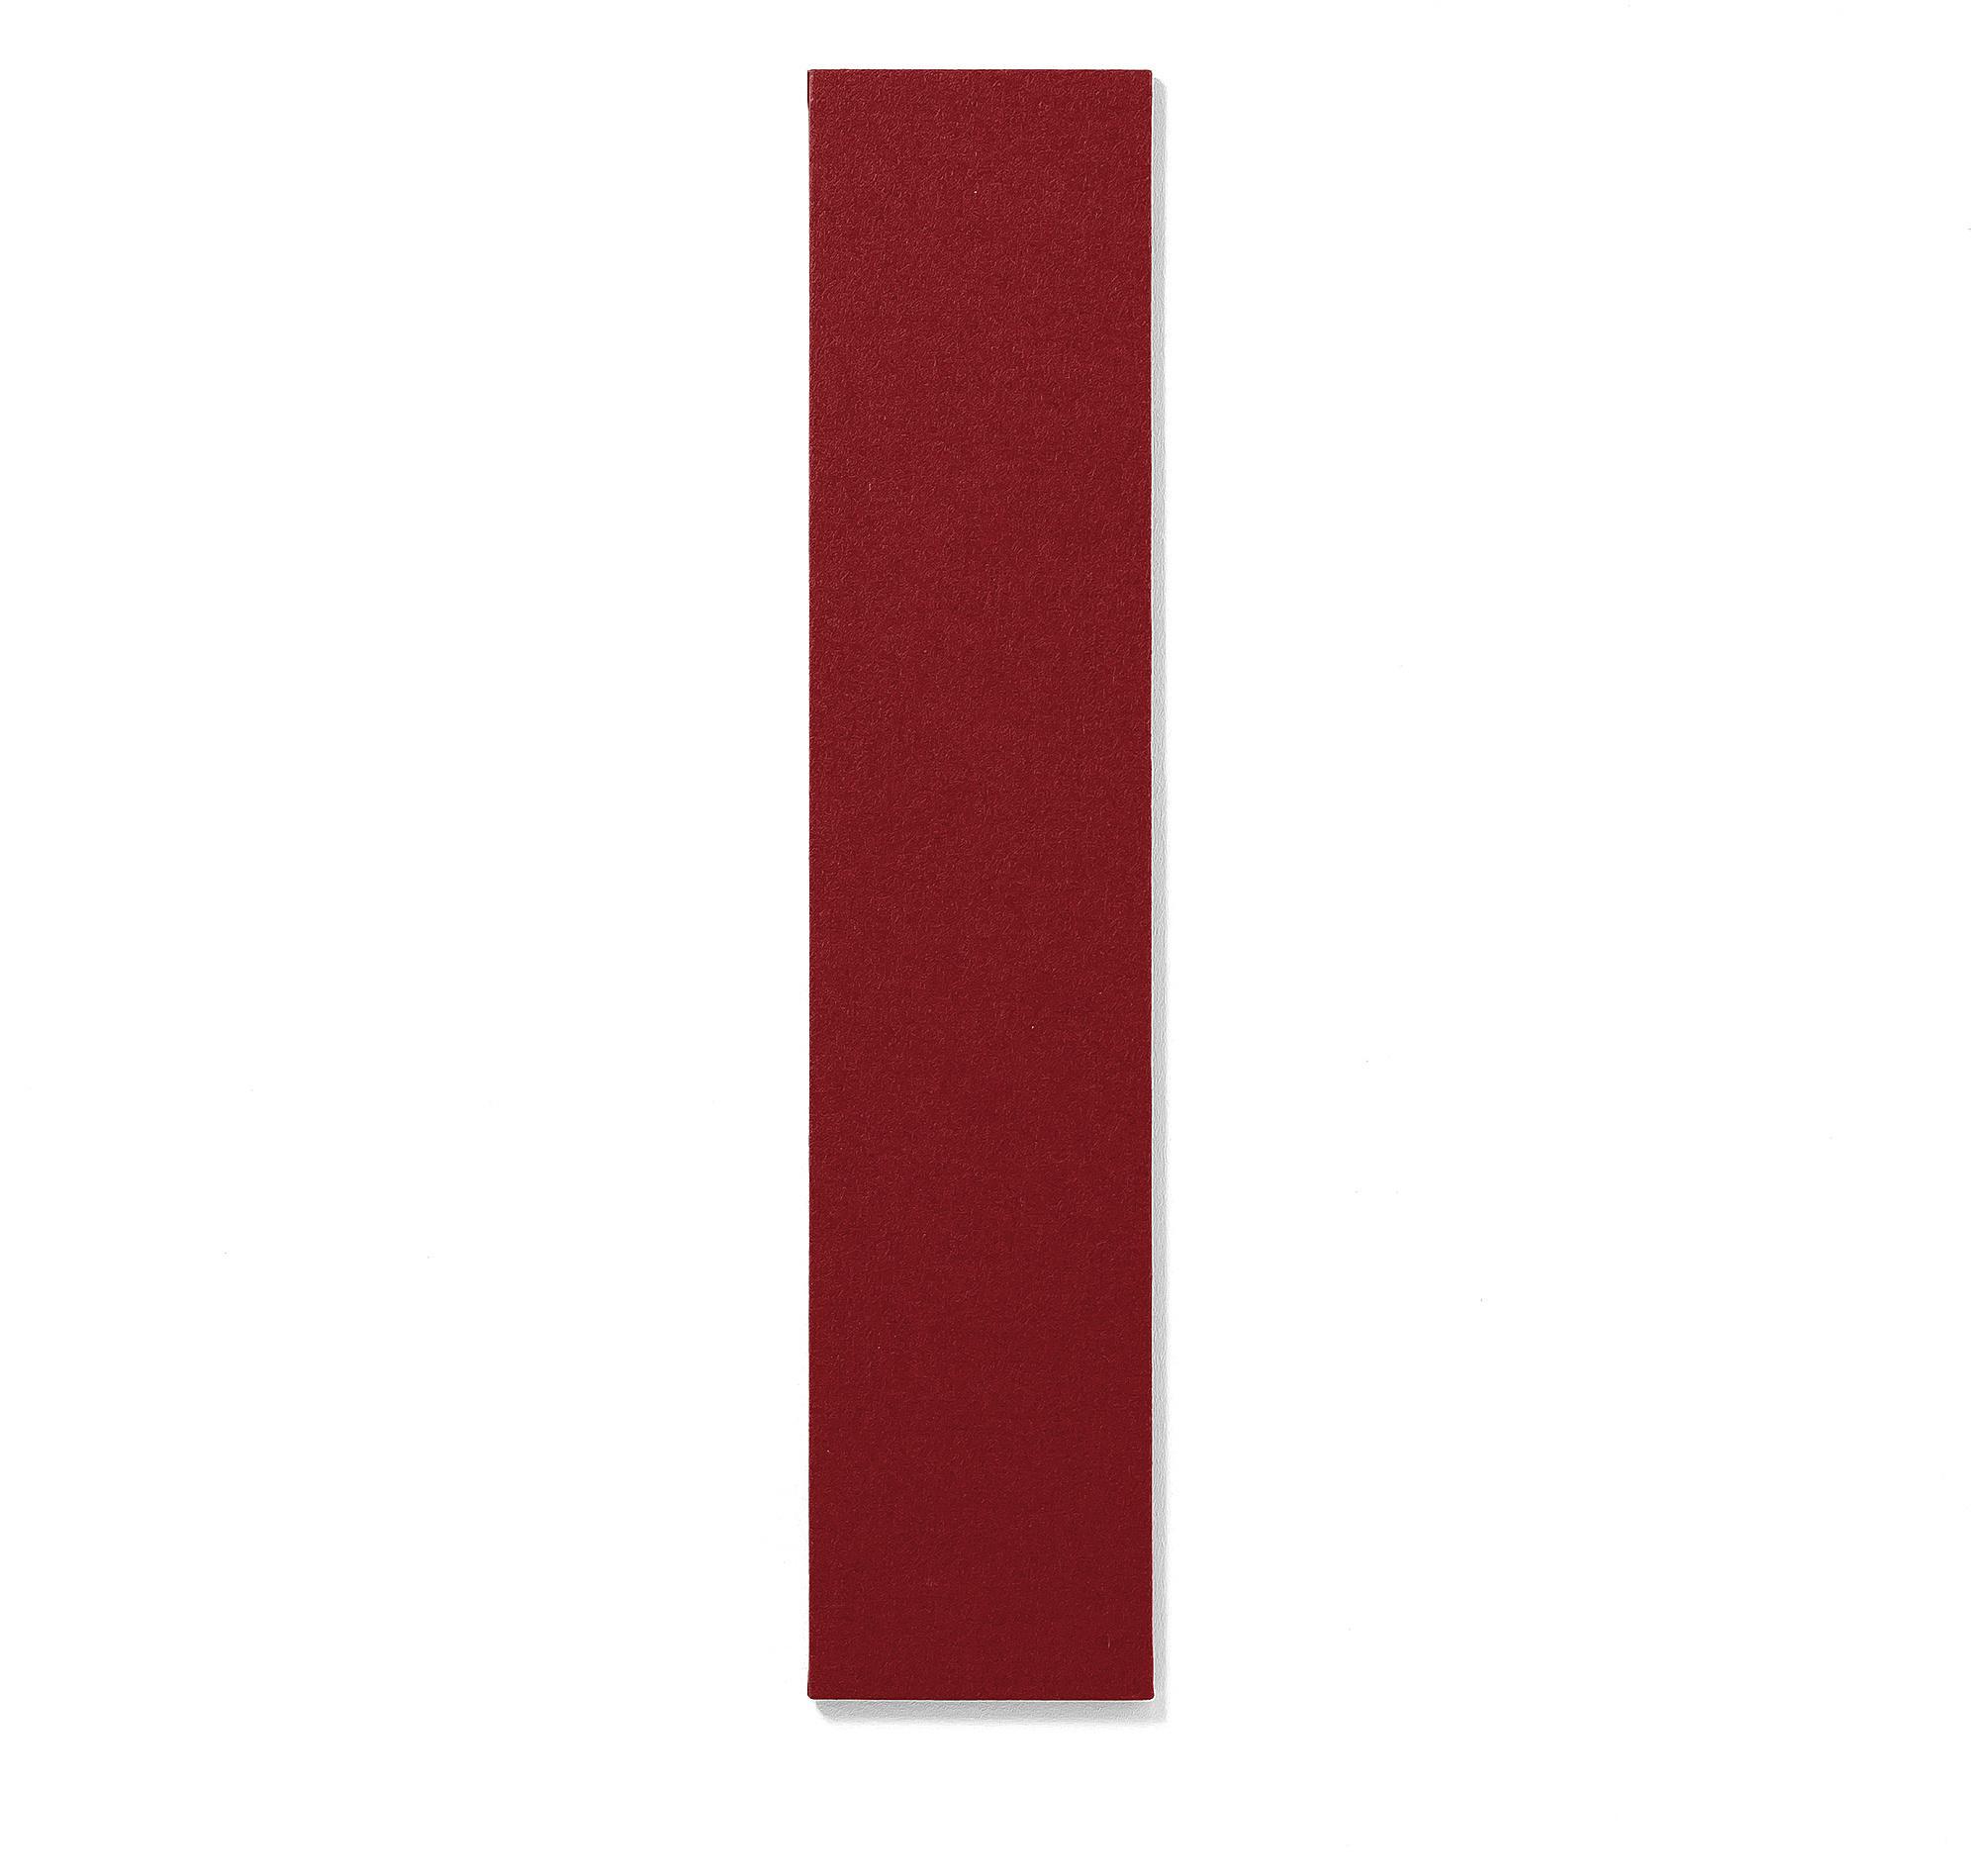 Bezrámová nástenka Air, 250x1190 mm, červená